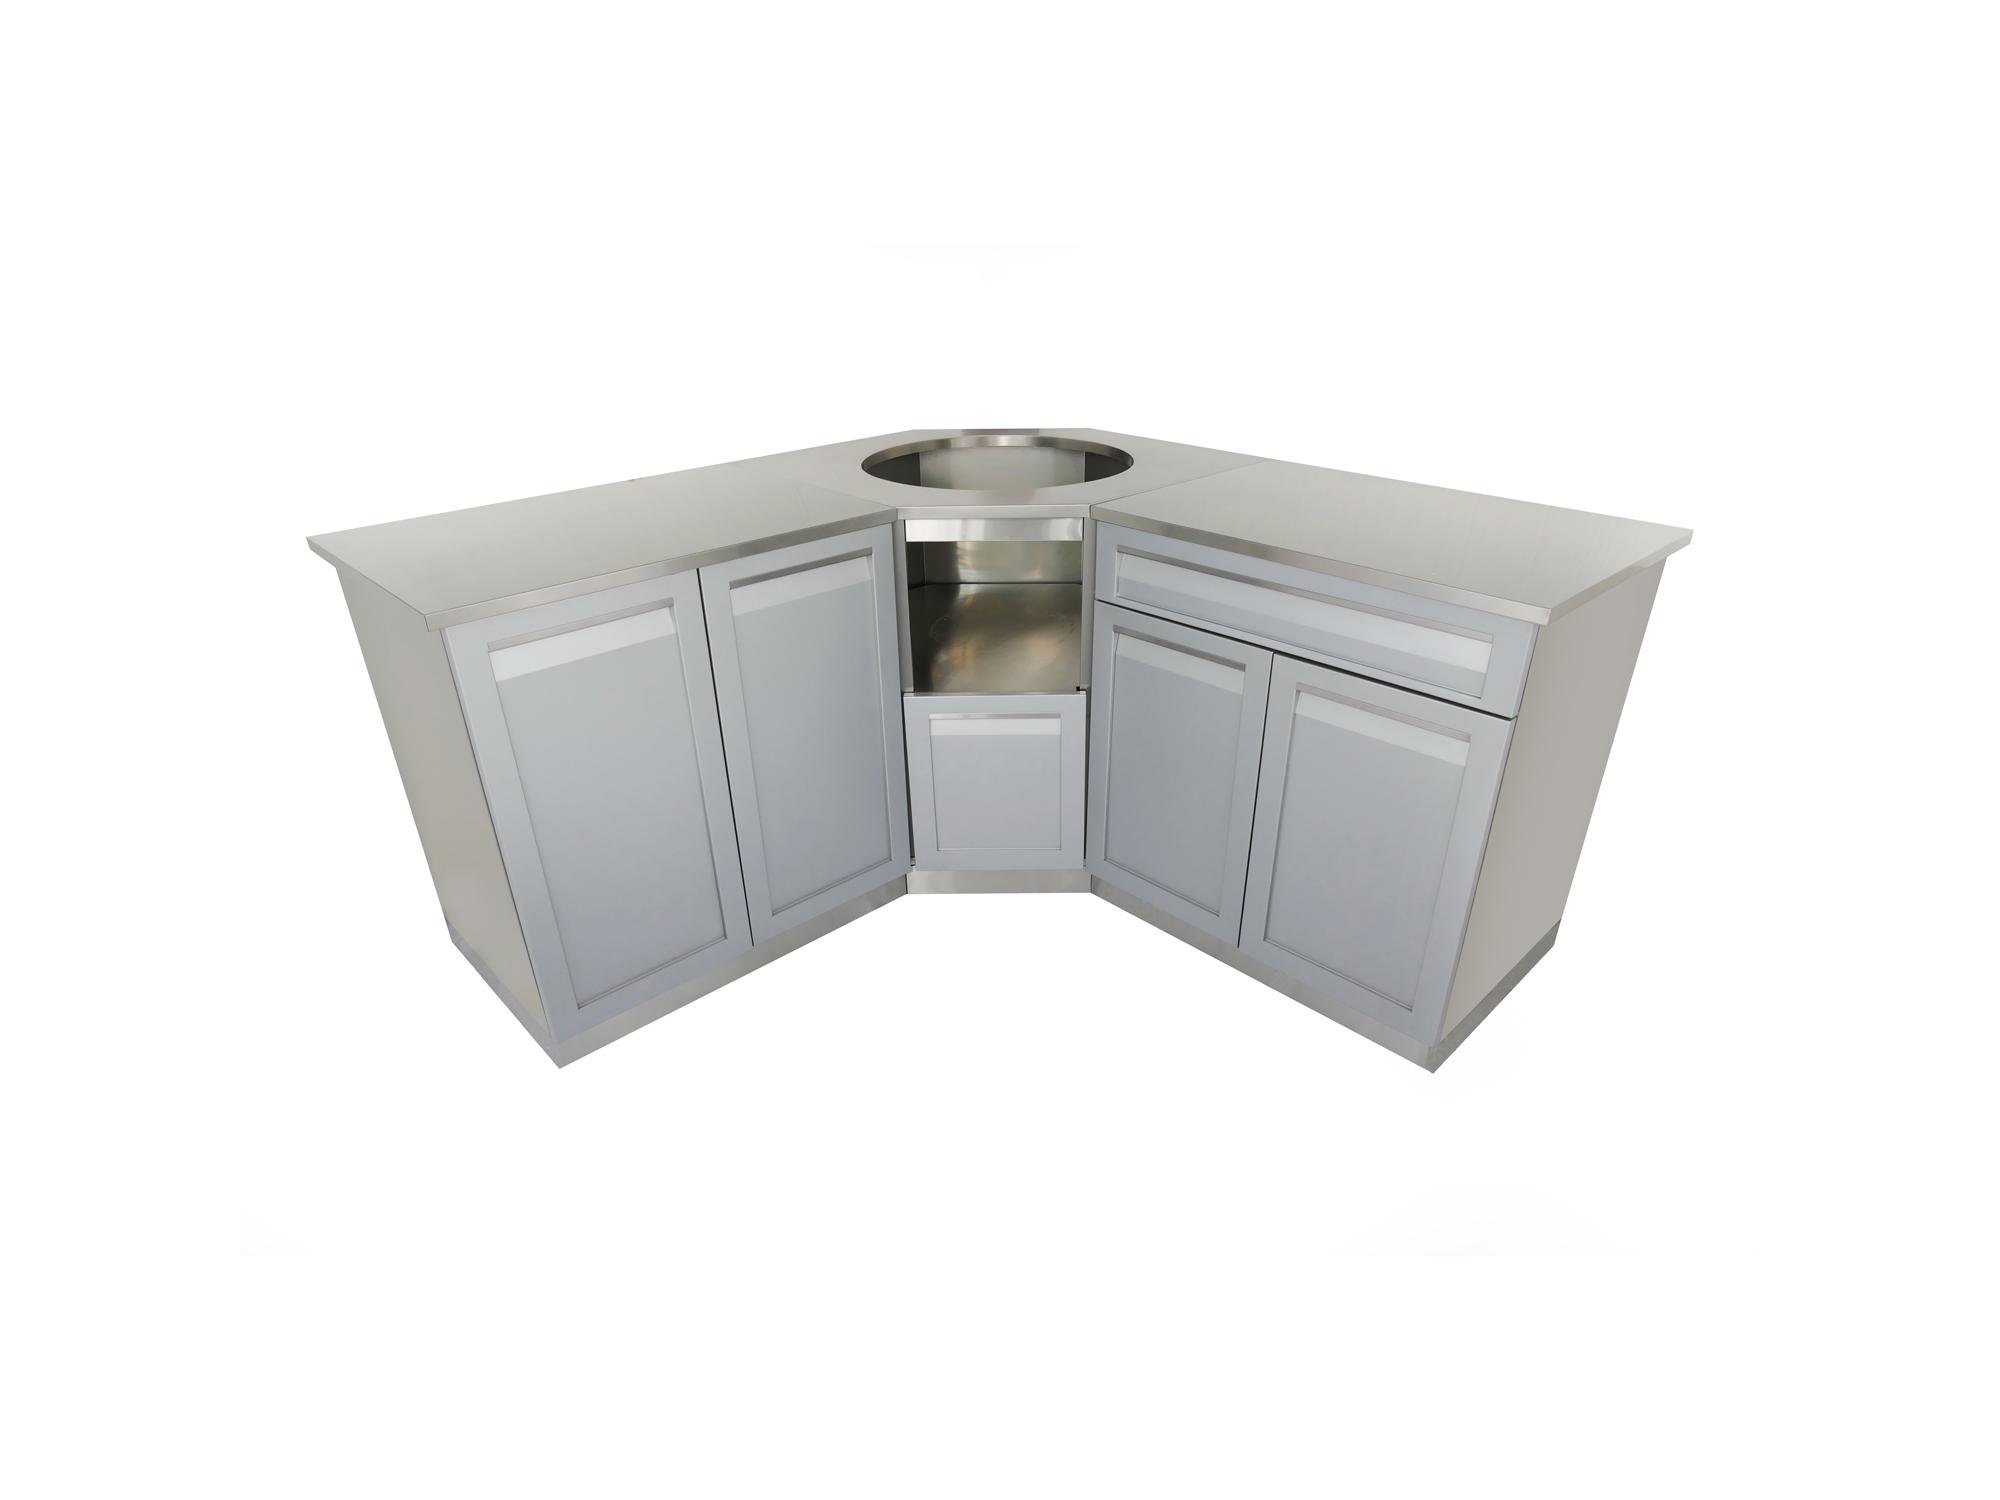 5 piece outdoor kitchen cabinet set g40031 4 life for Kitchen cabinet sets